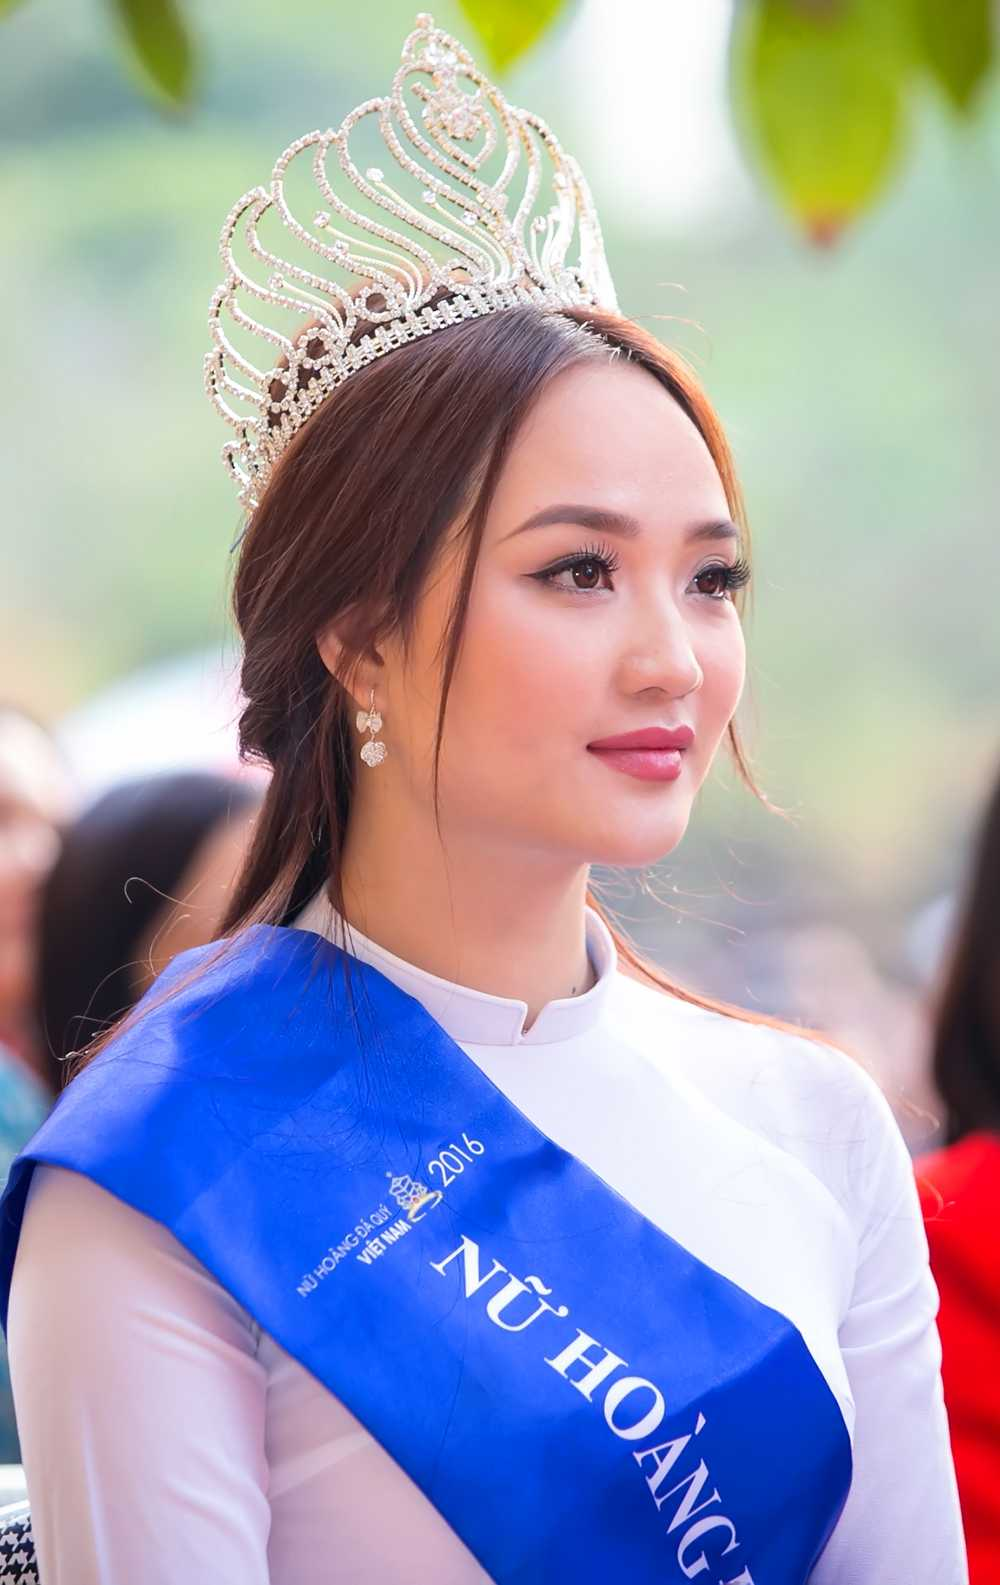 Nu hoang da quy Nguyen Thi Oanh dep tinh khoi ve tham truong cu hinh anh 2